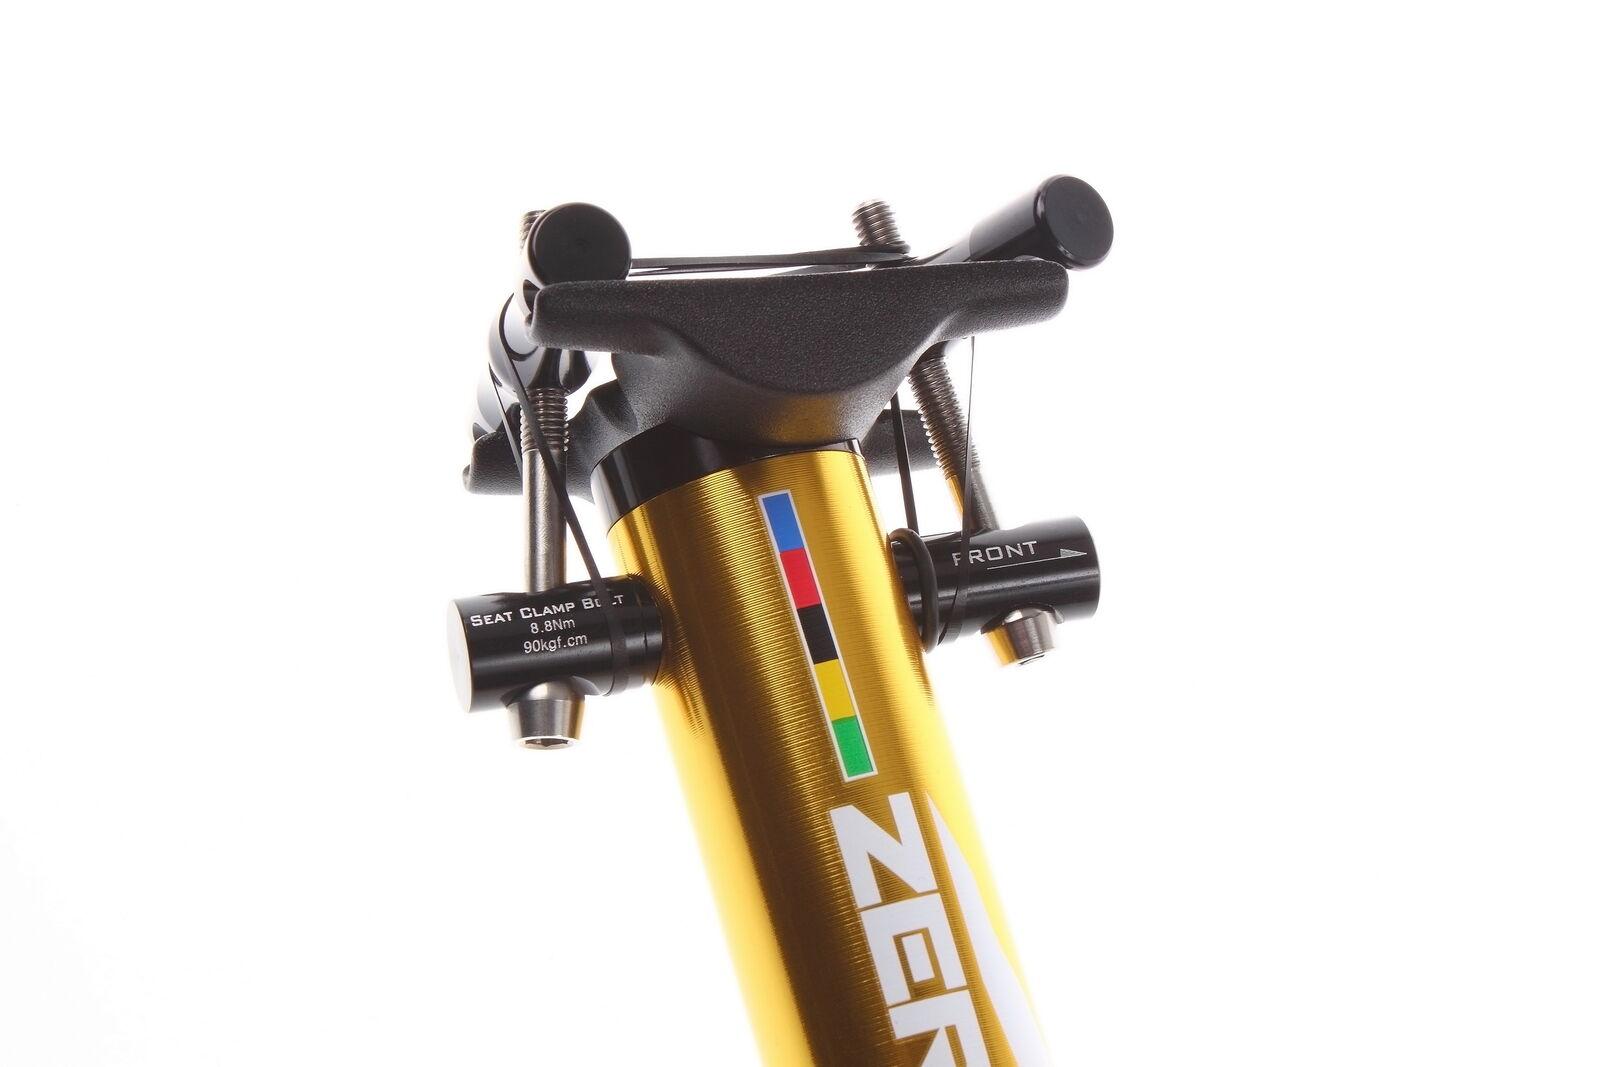 Aerozine XP-Zero Road Mountain CX Bicycle Seatpost Bike Post 27.2mm 400mm gold